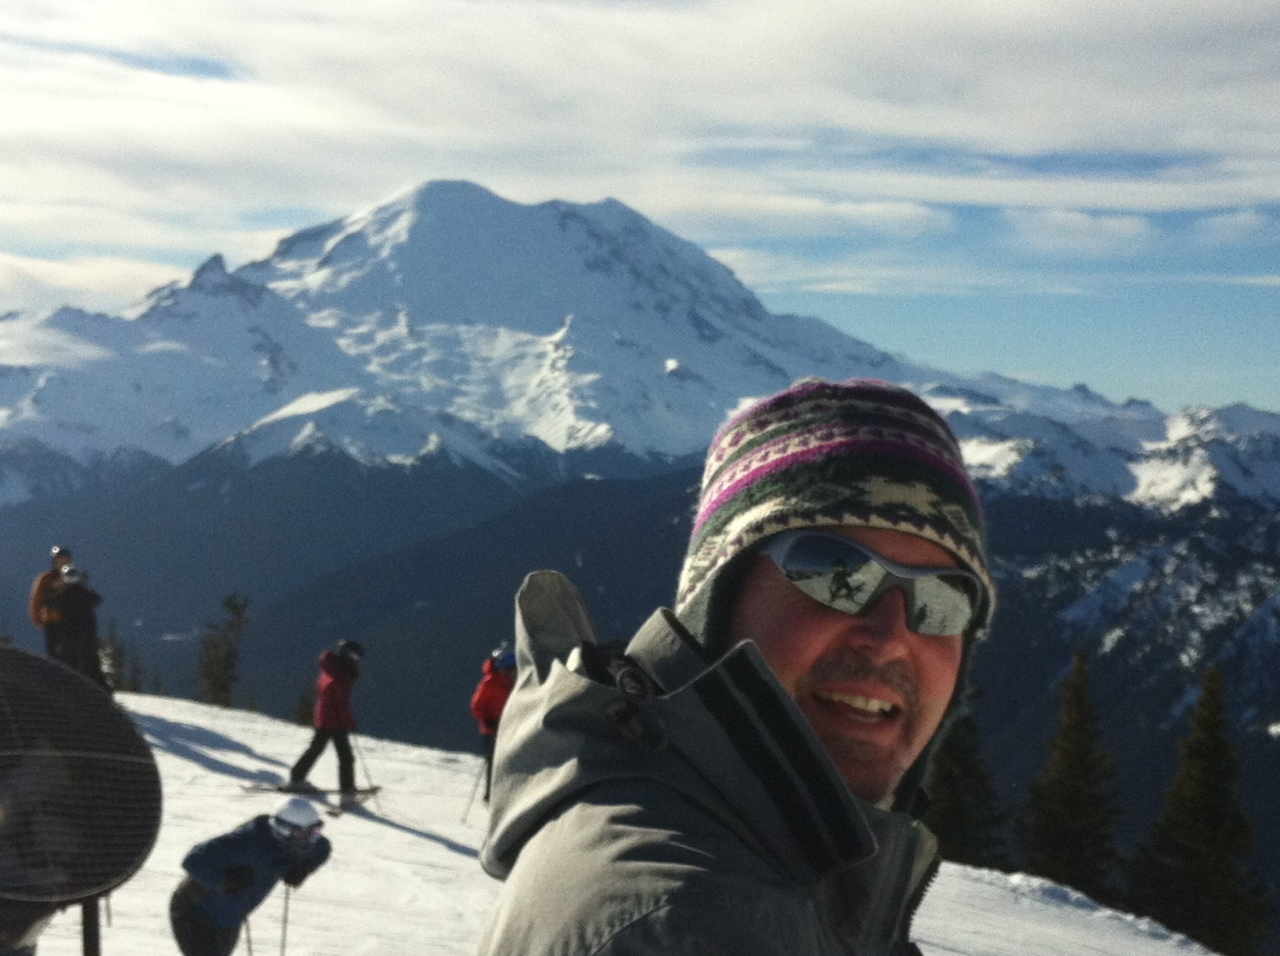 Tom skiing